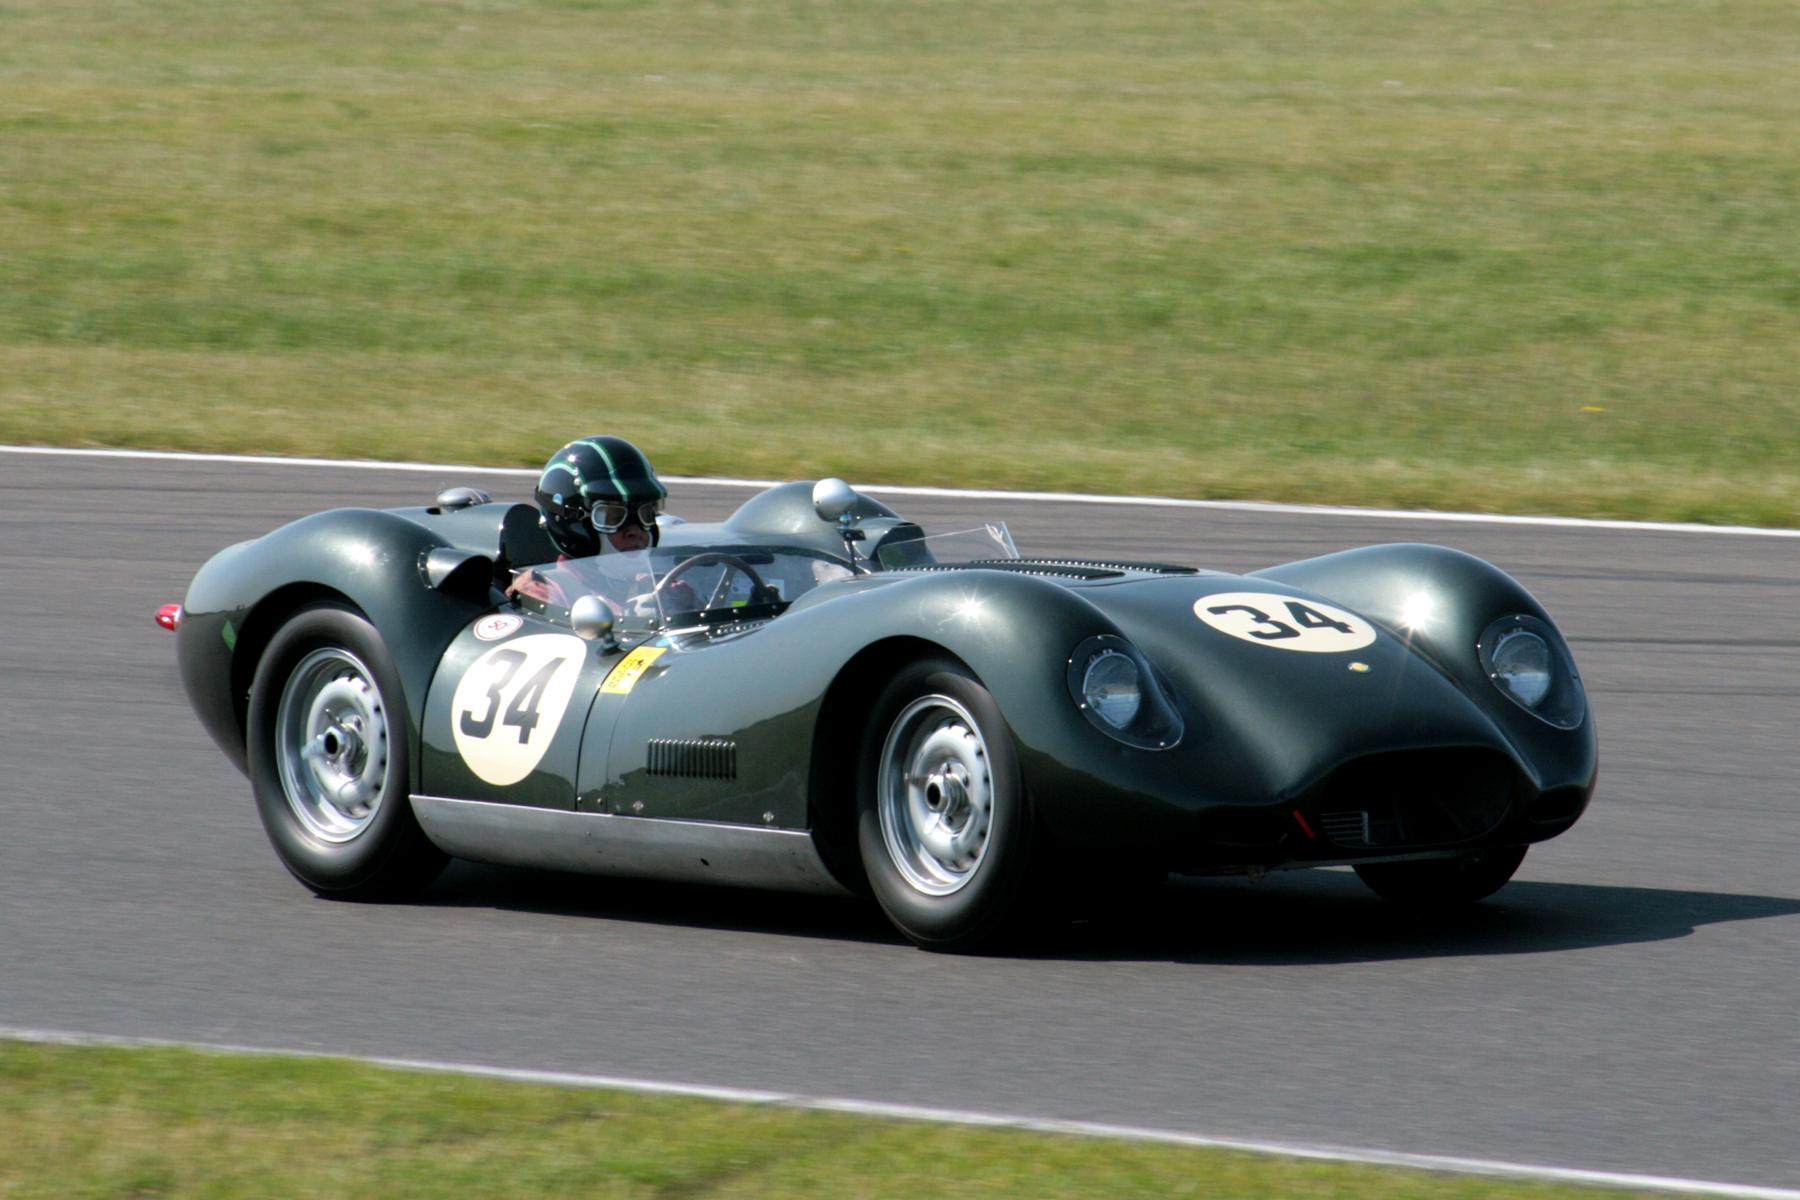 Richard Last really struggled for grip during qualifying in his Lister Jaguar  Photo - John Turner